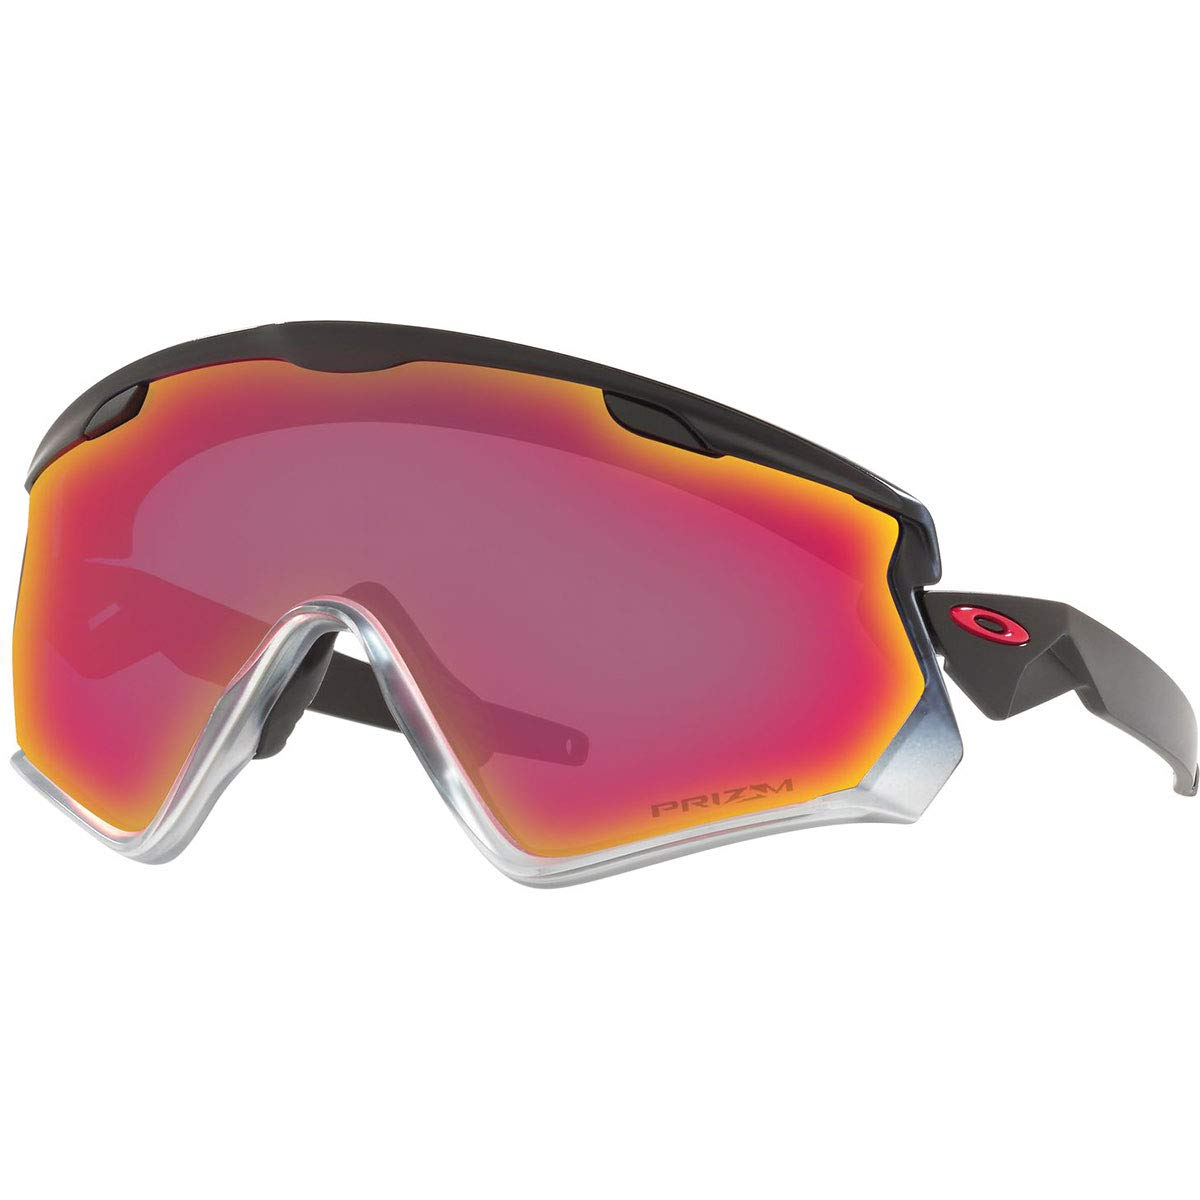 39328ab42c007 Amazon.com  Oakley Men s Wind Jacket 2.0 Sunglasses